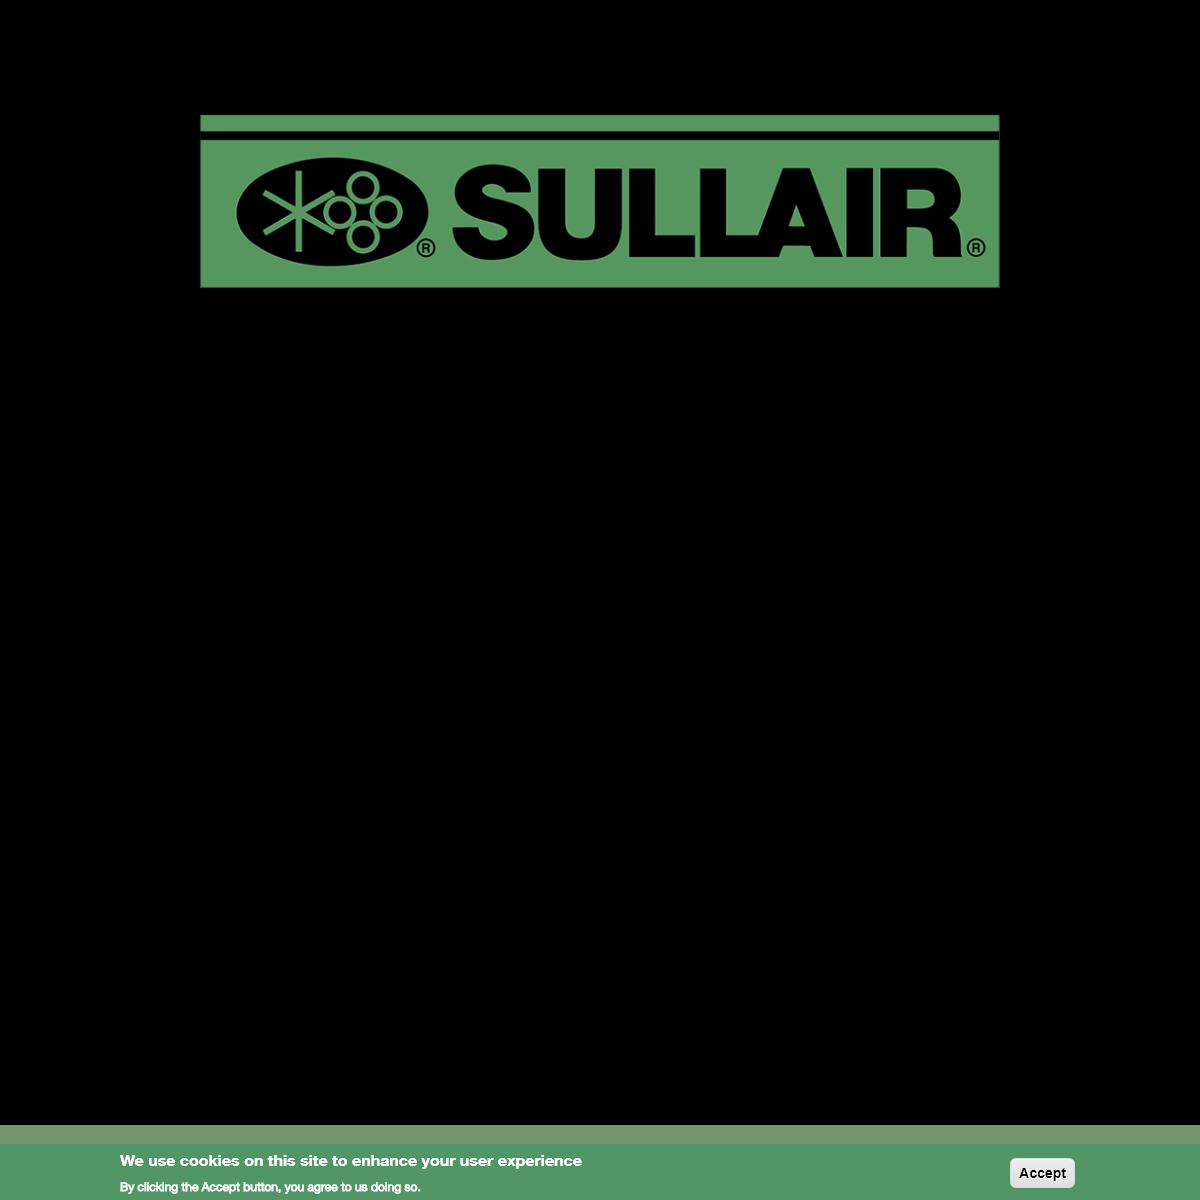 Sullair Industrial & Portable Air Compressors